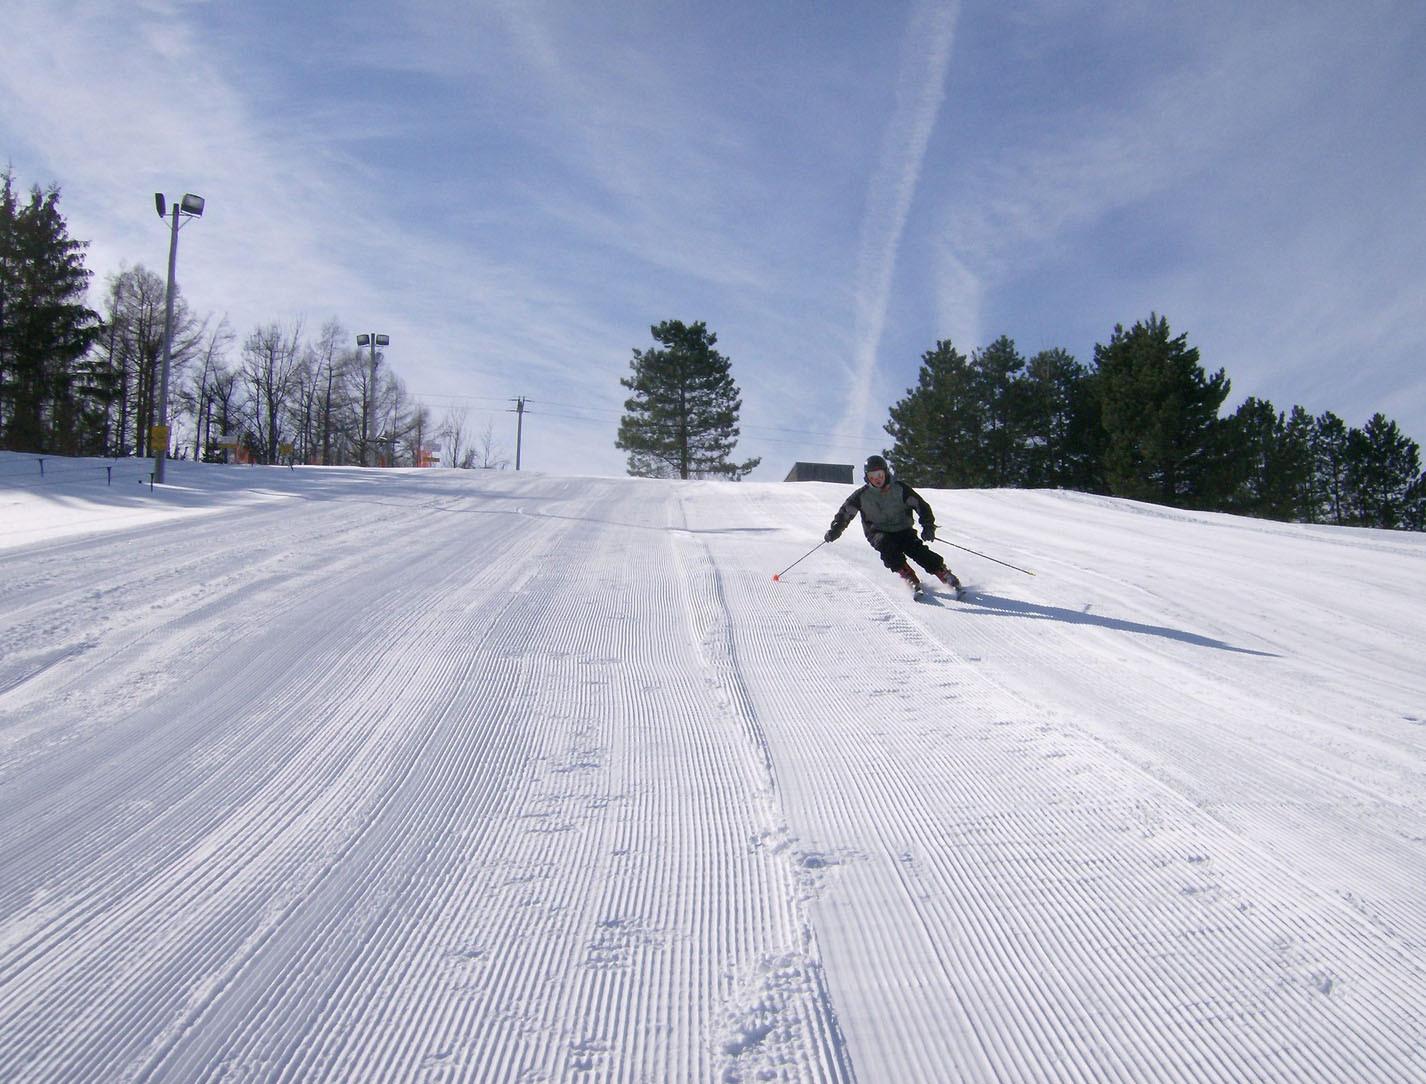 trip to slope|slopes travel planner app